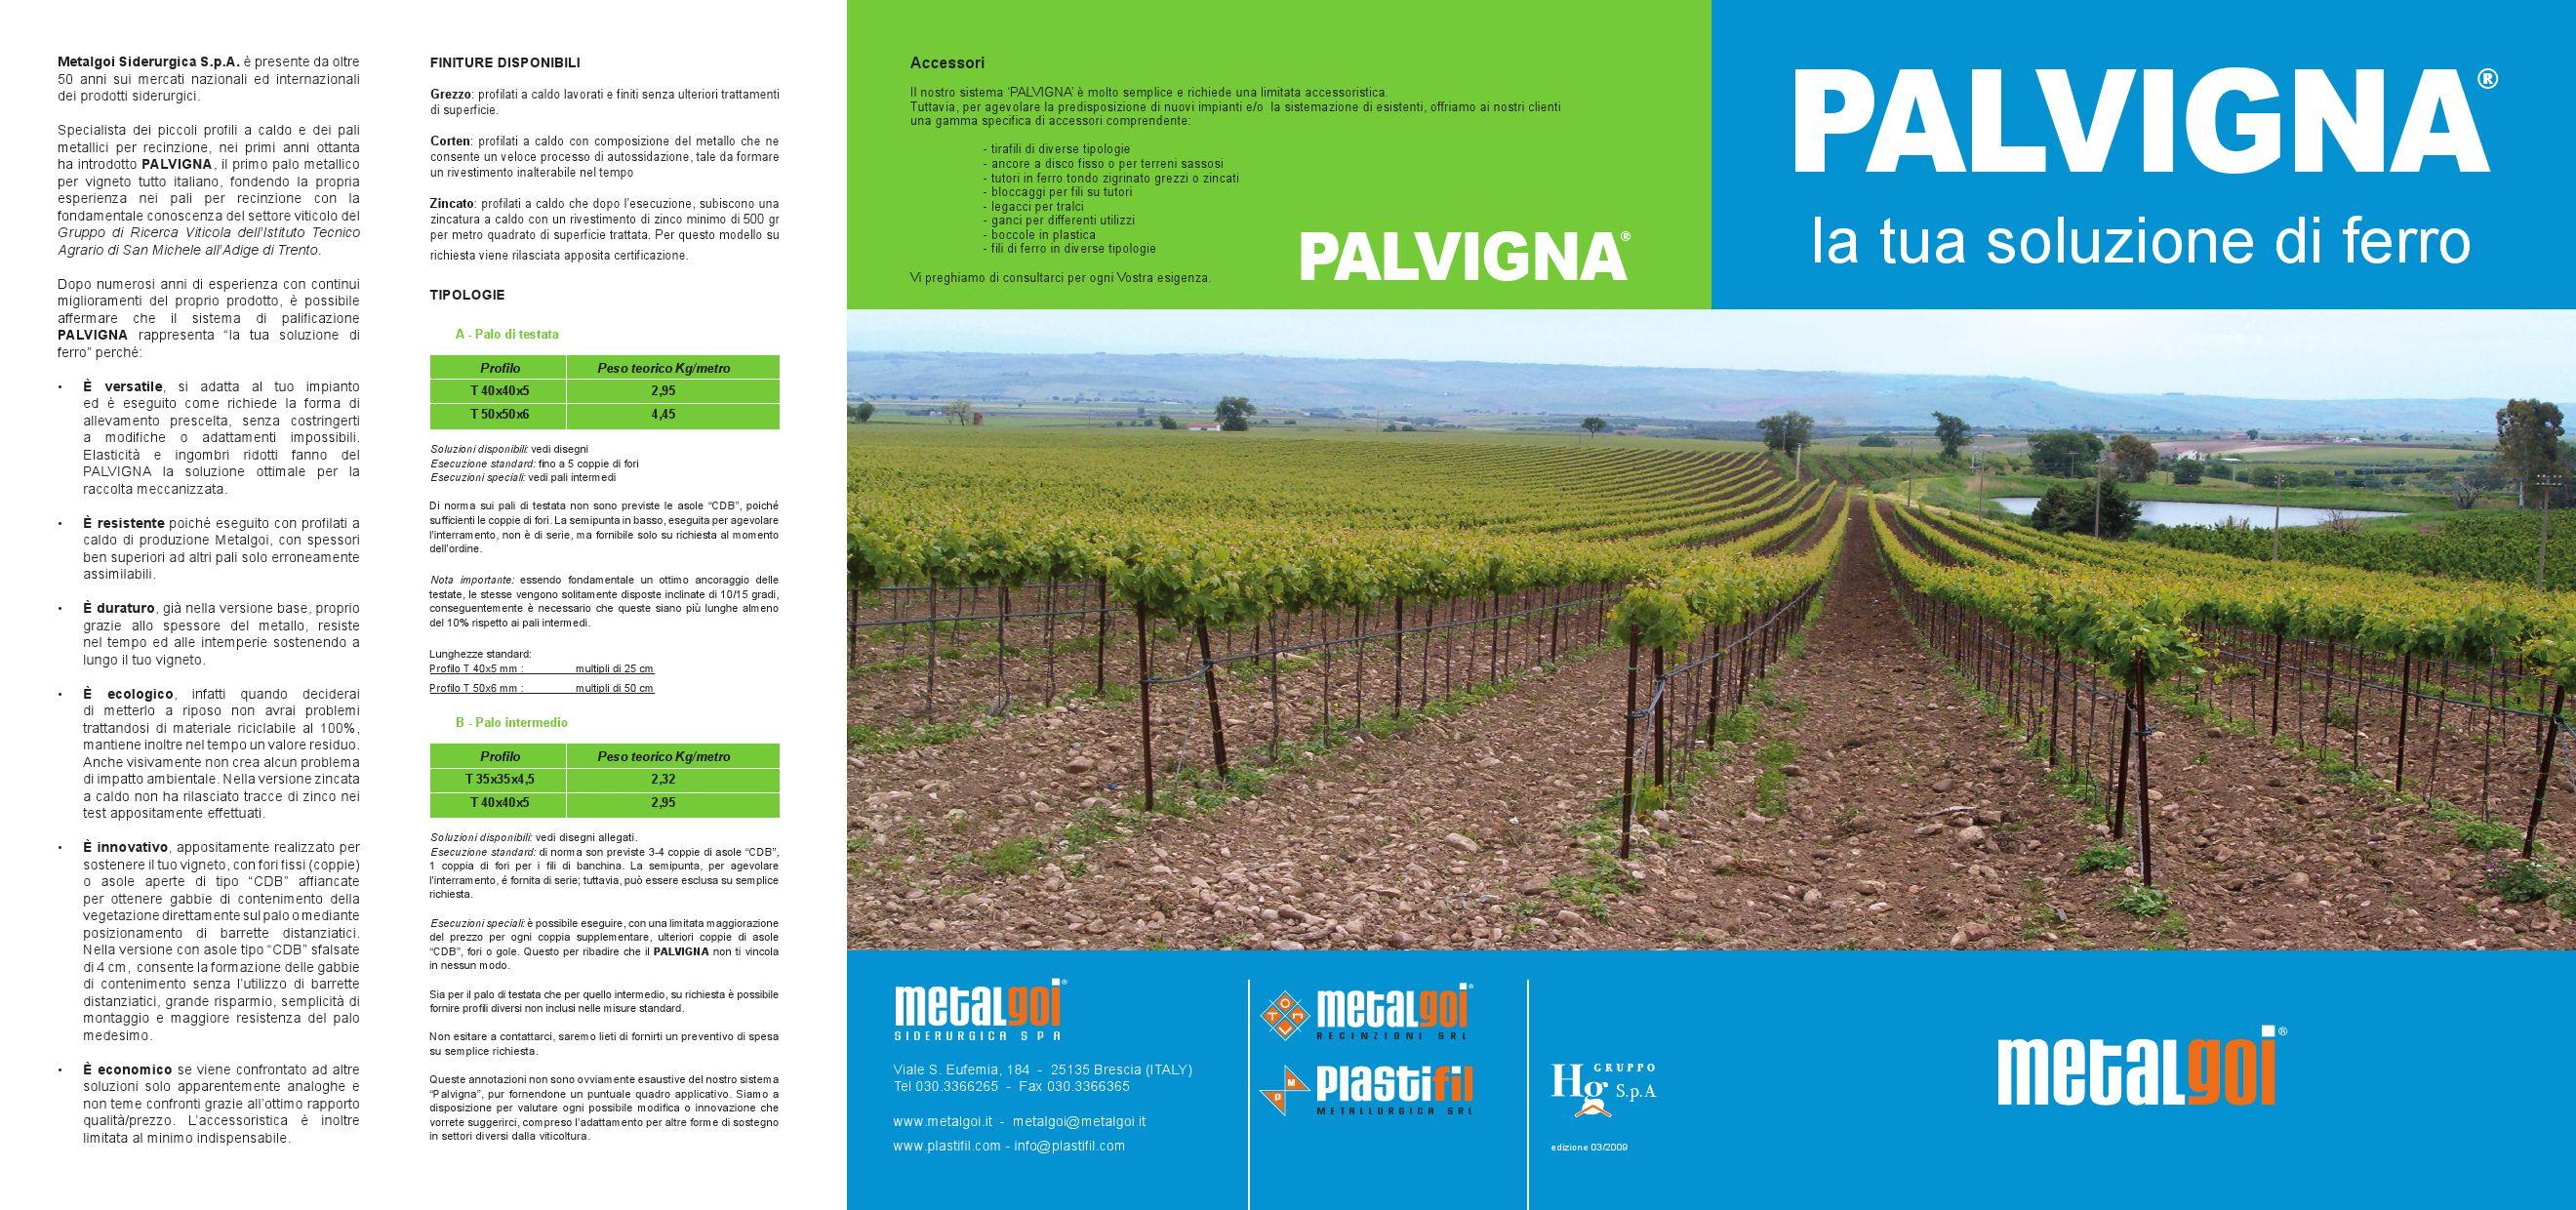 Costo Profilati Ferro Al Kg metalgoi palvigna by riccardo polver - issuu